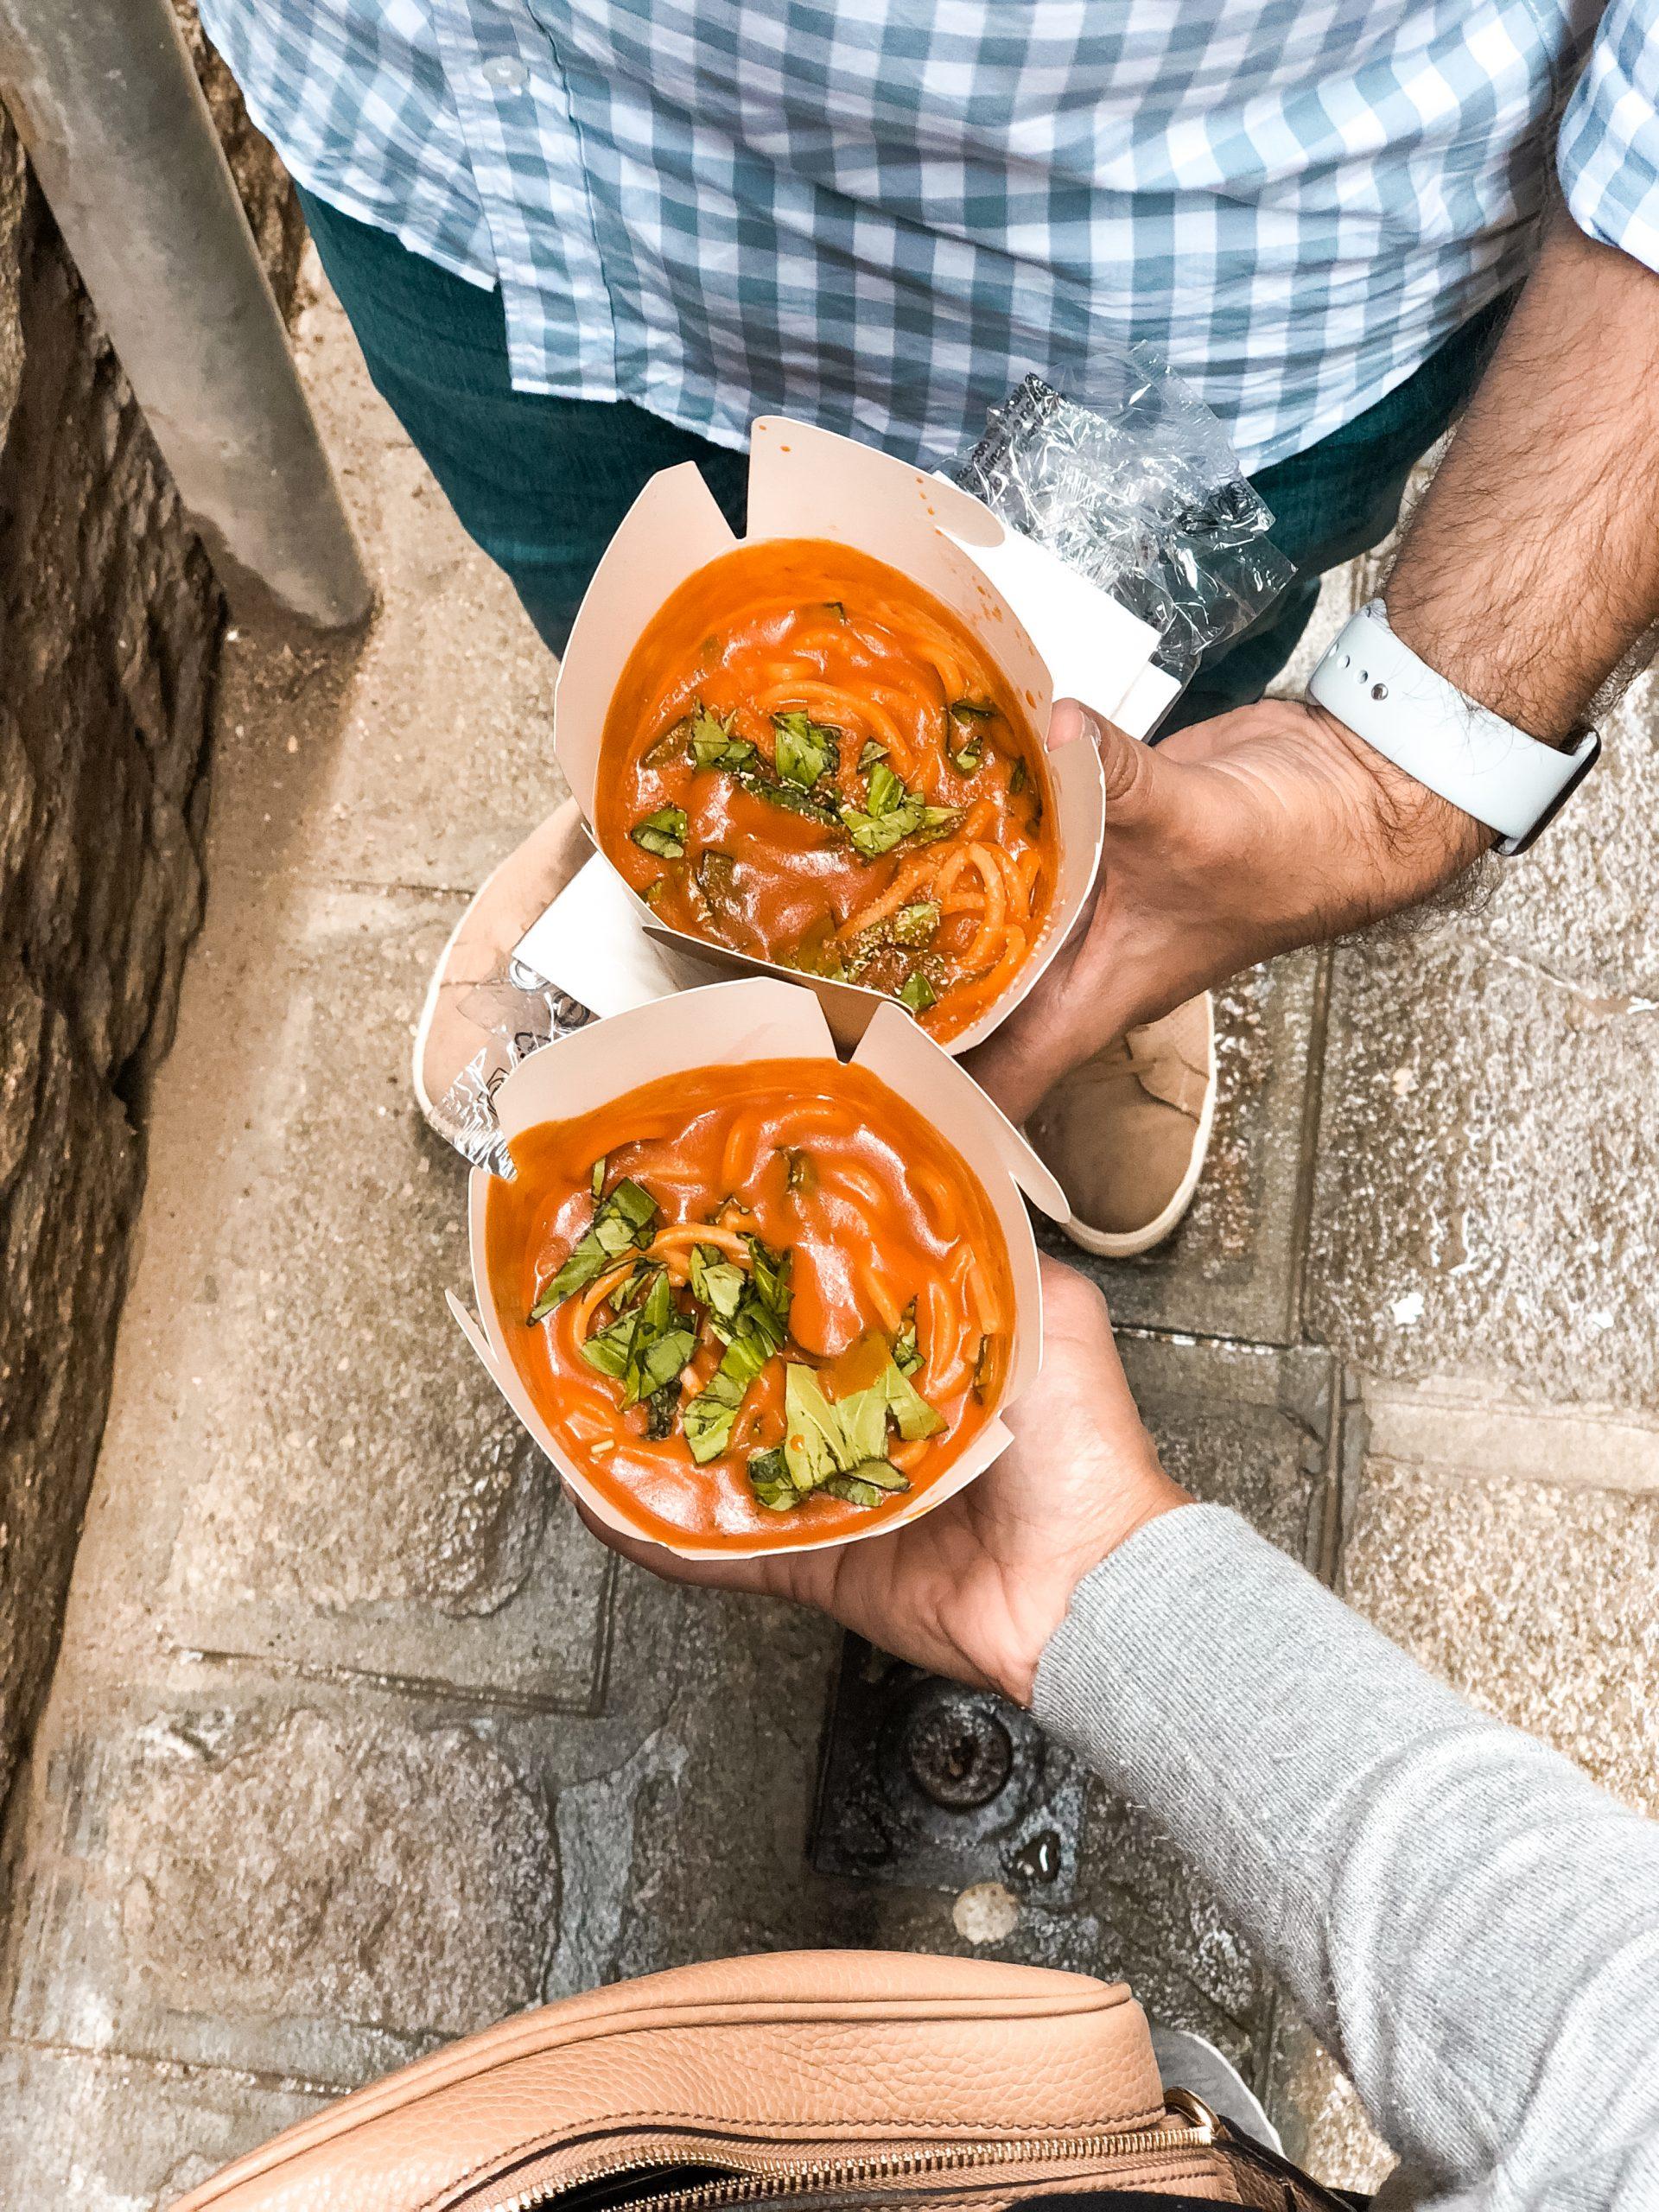 tomato basil sauce on fresh pasta from pasta to go